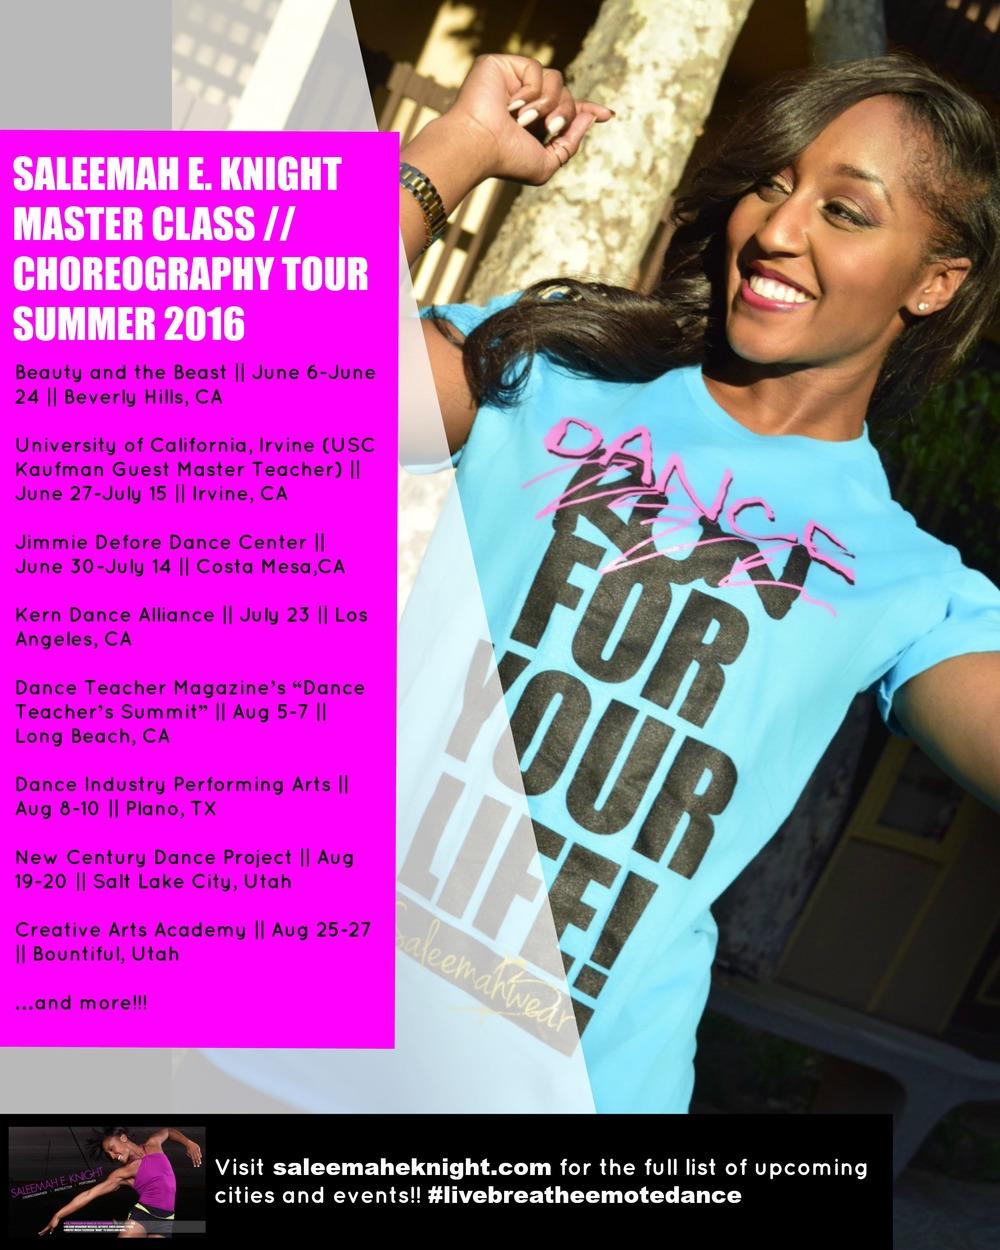 Saleemah E. Knight Master Class Tour 2016